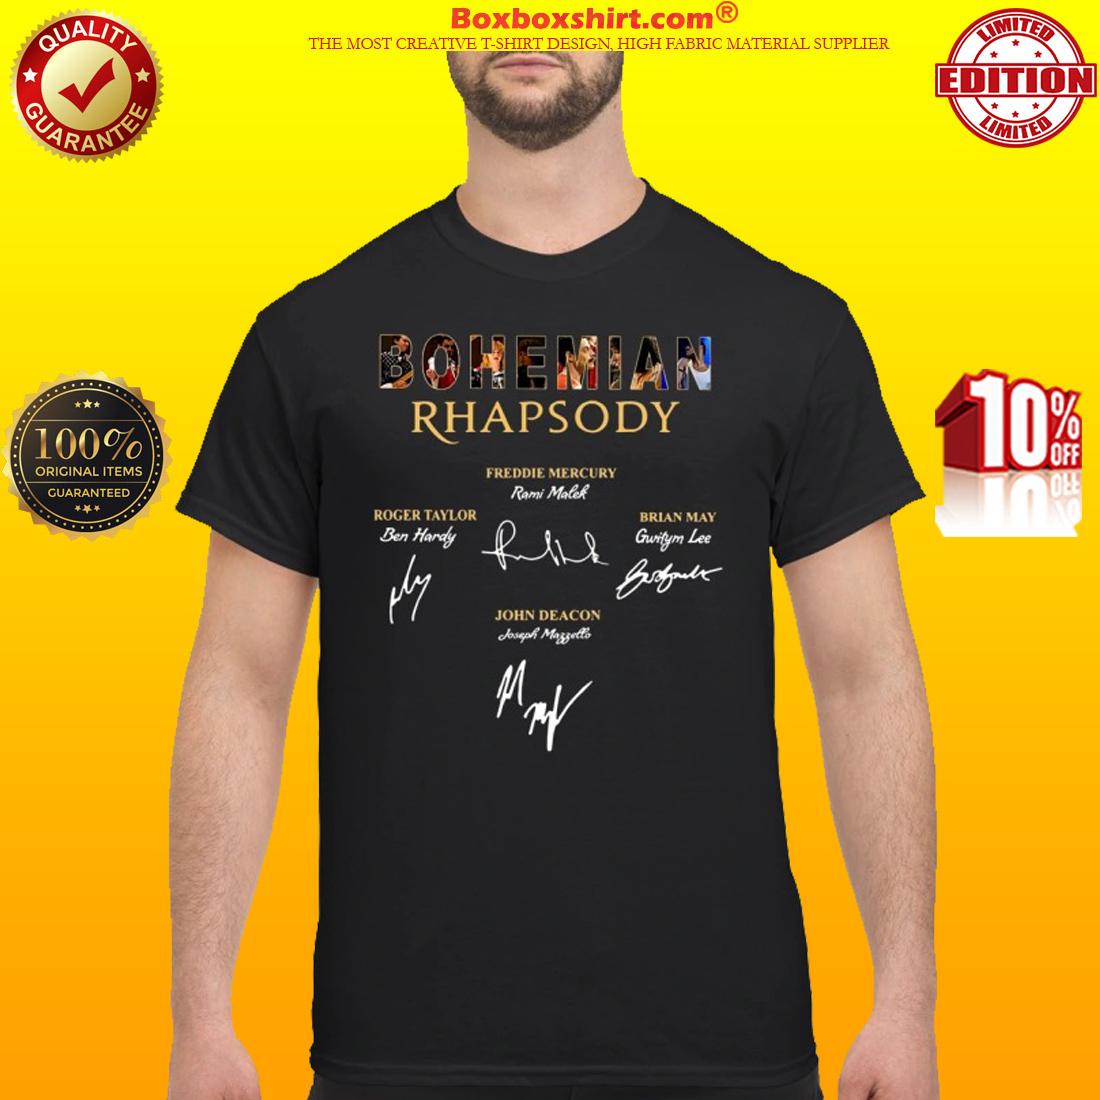 Bohemian Rhapsody Freddie Mercury Signatures shirt